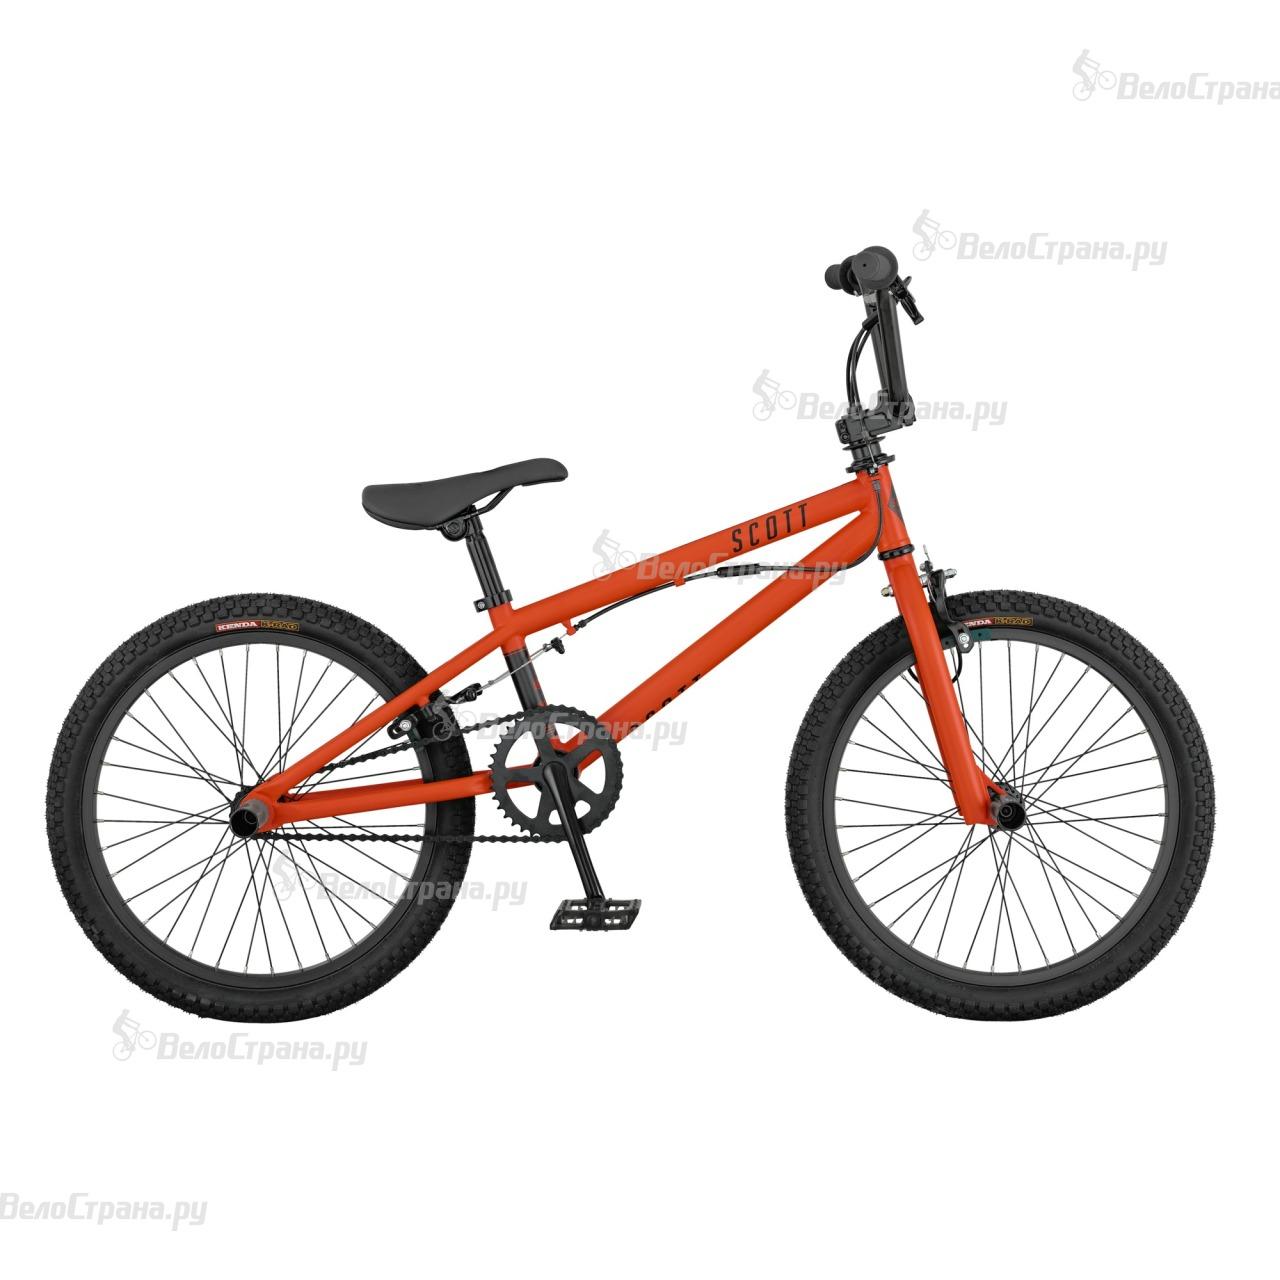 Велосипед Scott Volt-X 30 (2017) ручной фонарик ray bow rb 103k rb 103k led 10w